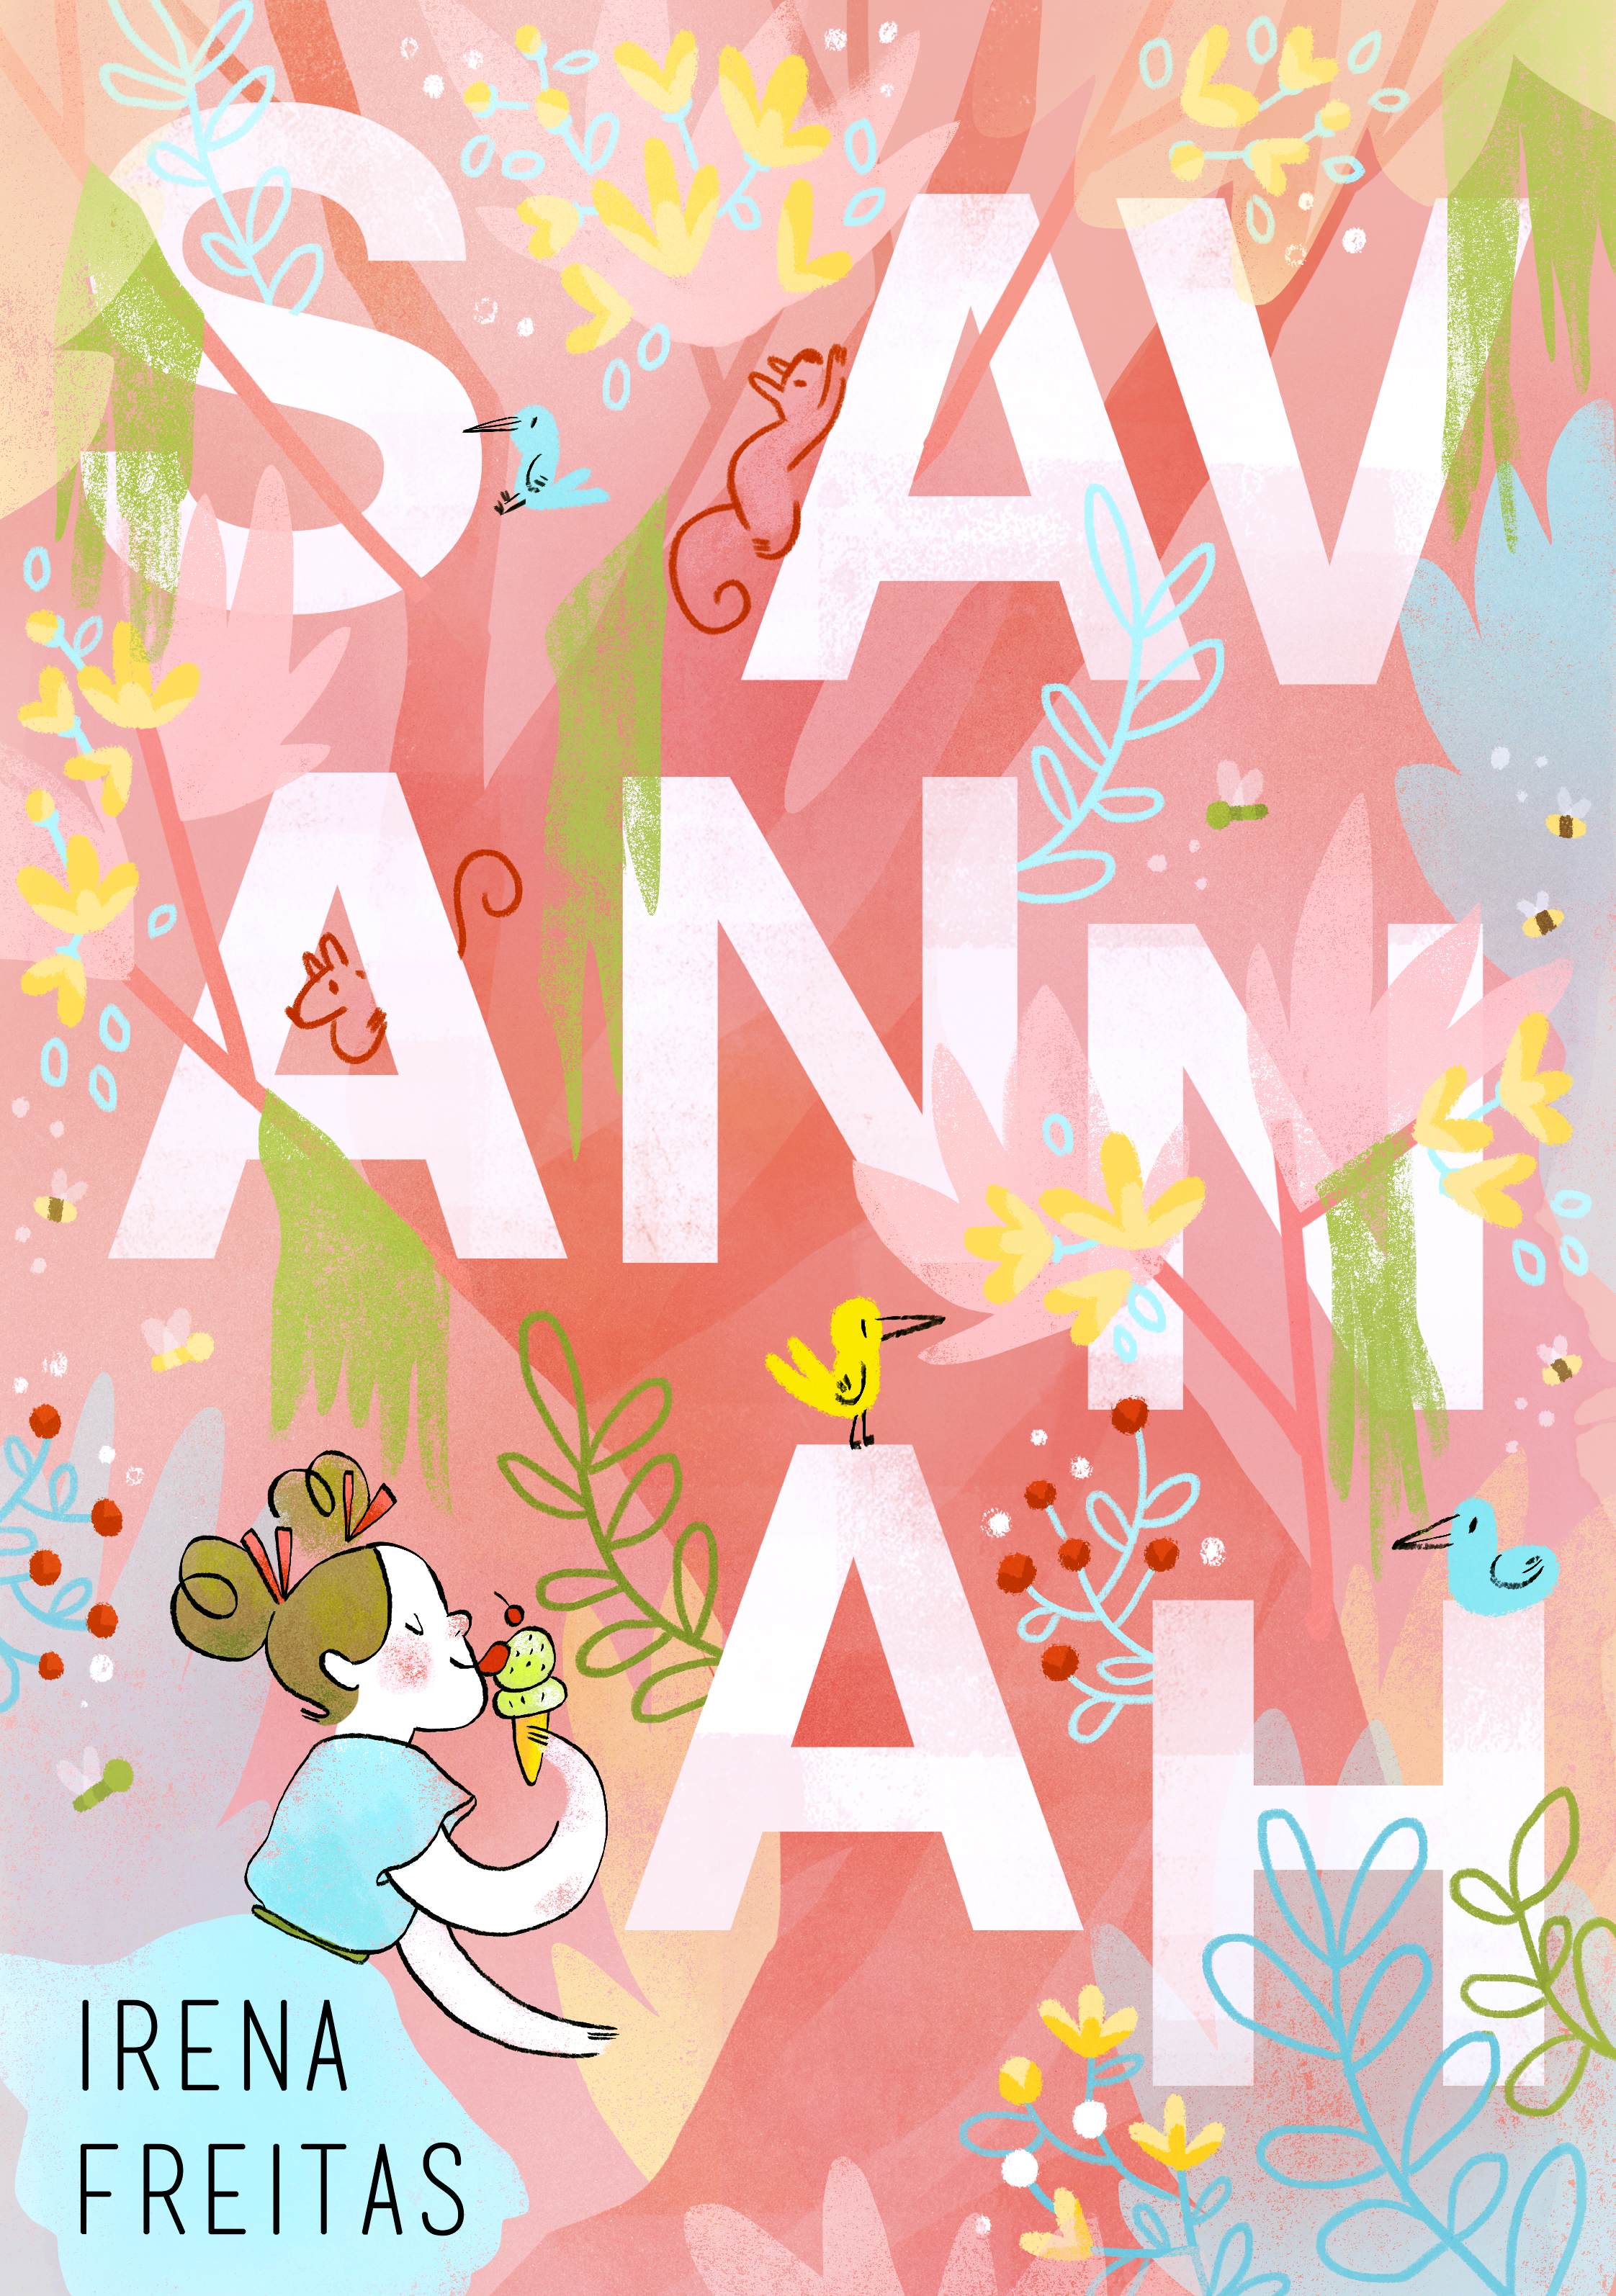 savannahcover.jpg